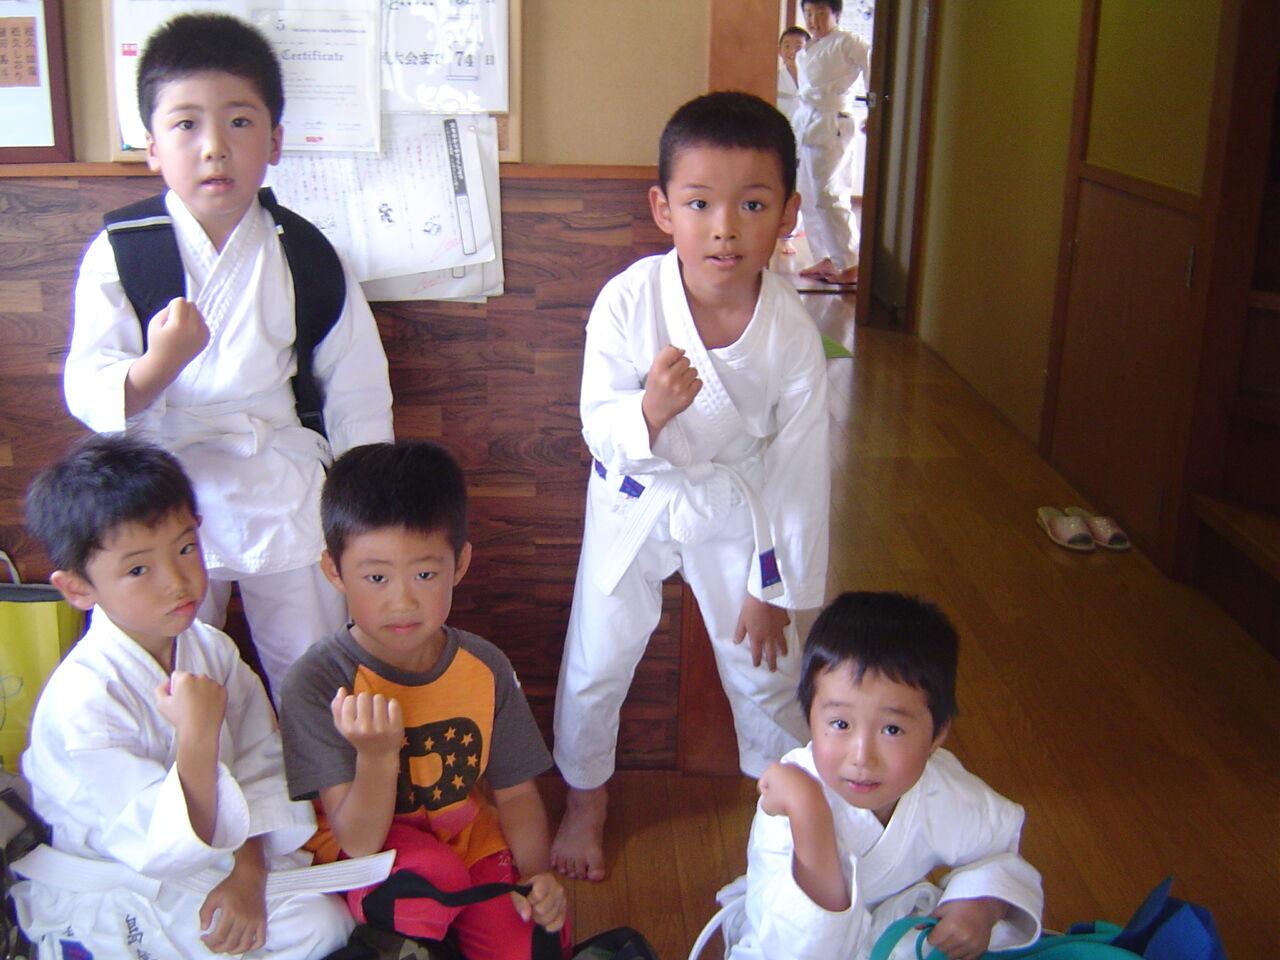 https://livedoor.blogimg.jp/ikouyou_1204/imgs/8/3/8332e9d9.jpg